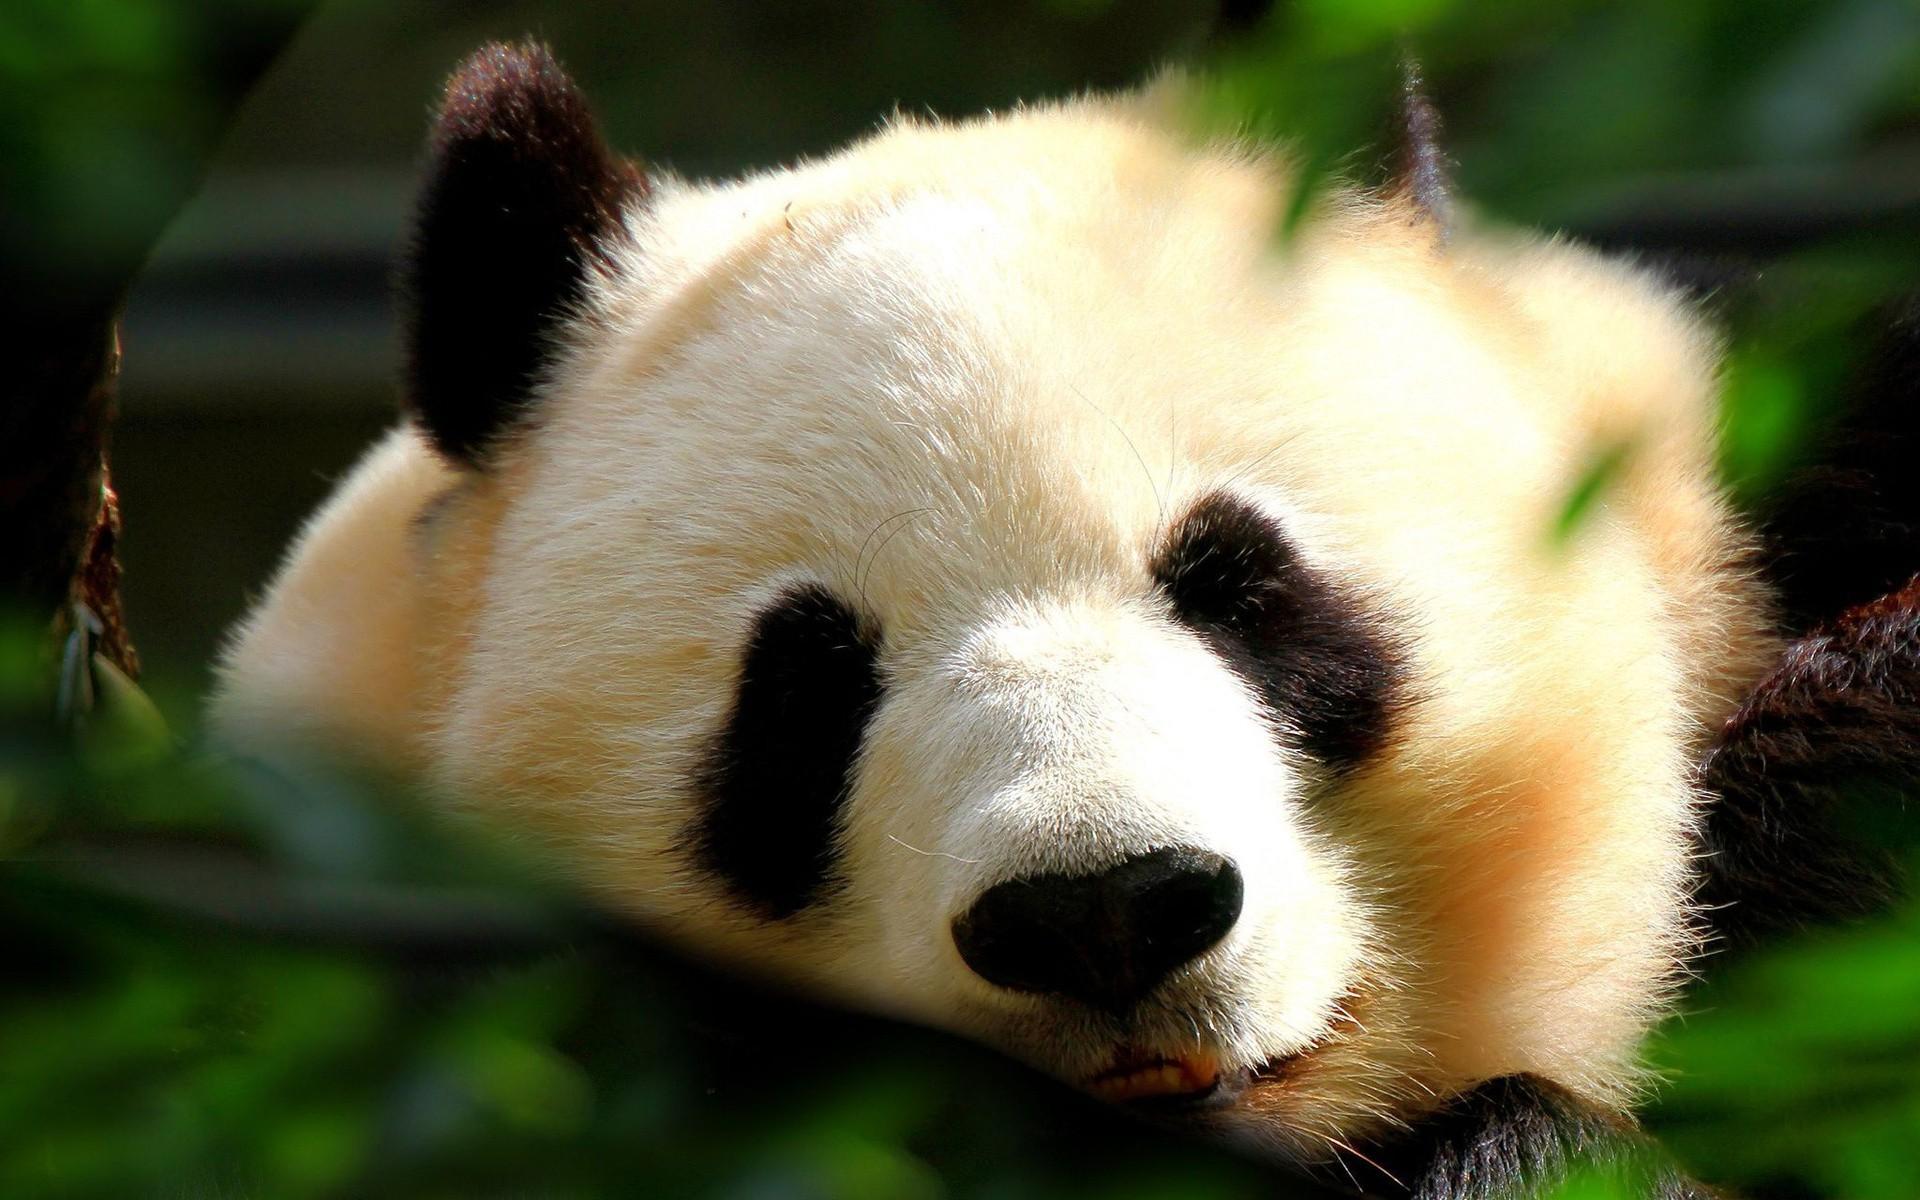 Japan animals panda bears wallpaper | 1920x1200 | 11881